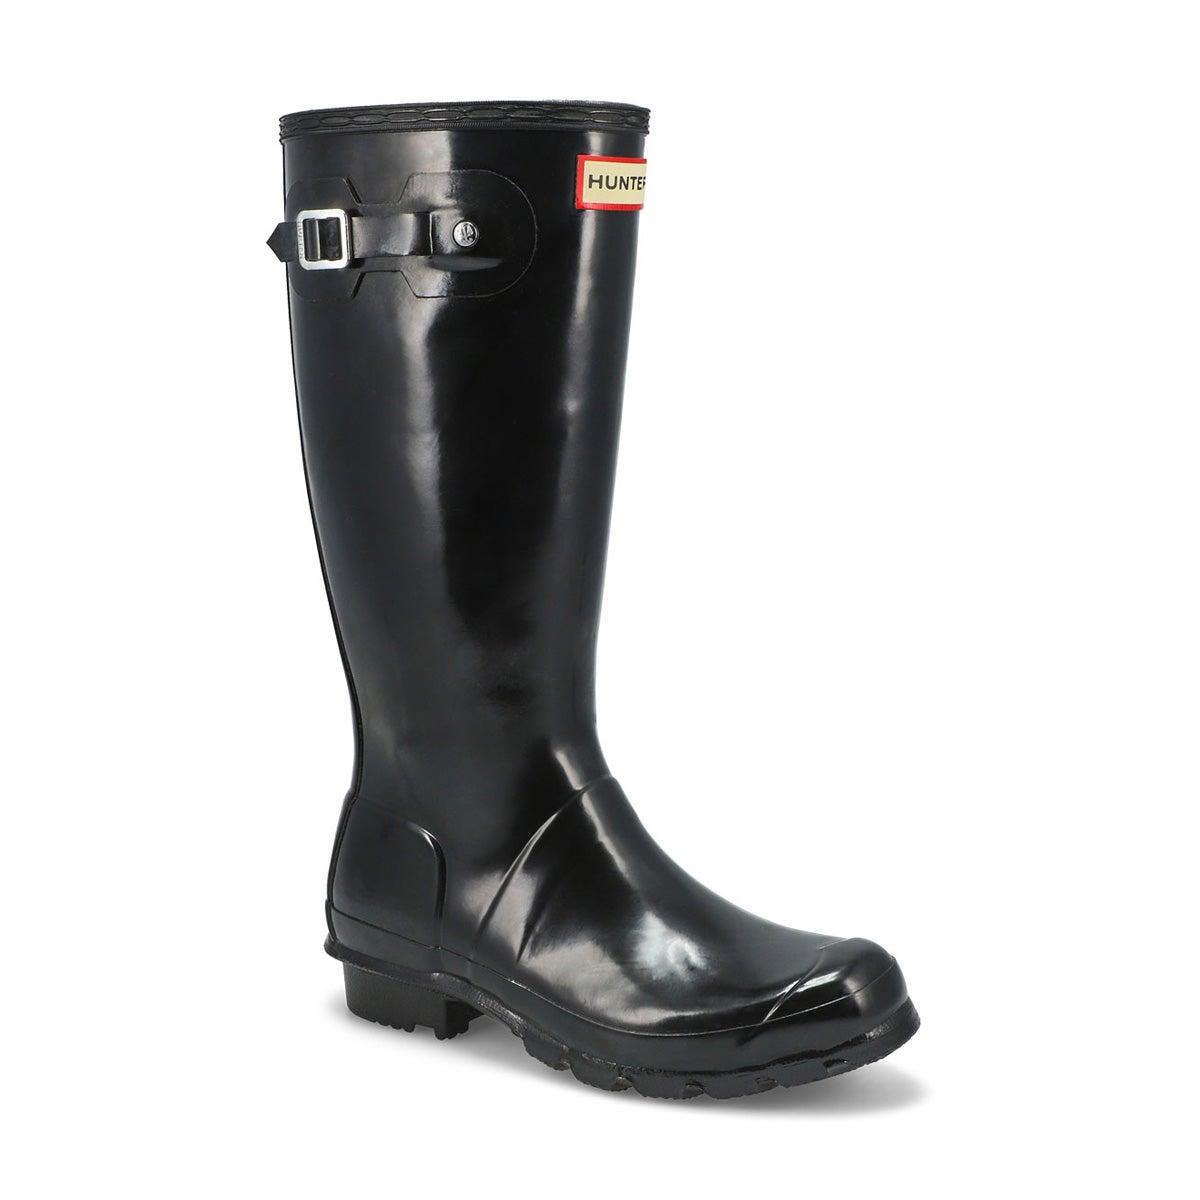 Girls' ORIGINAL YOUNG GLOSS black rain boots